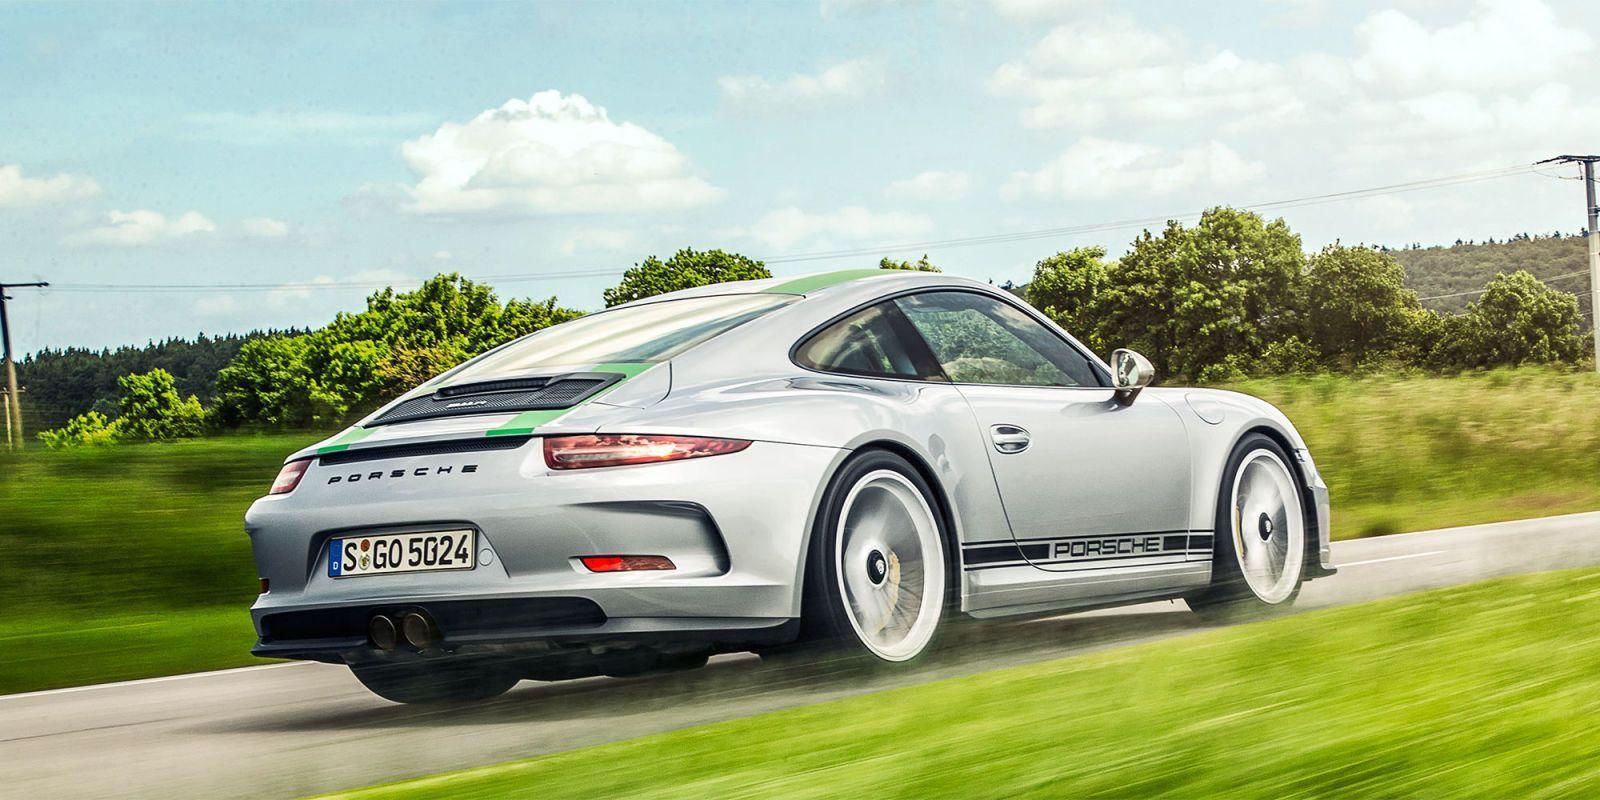 Listen to a Porsche 911 R Accelerate to 180 MPH